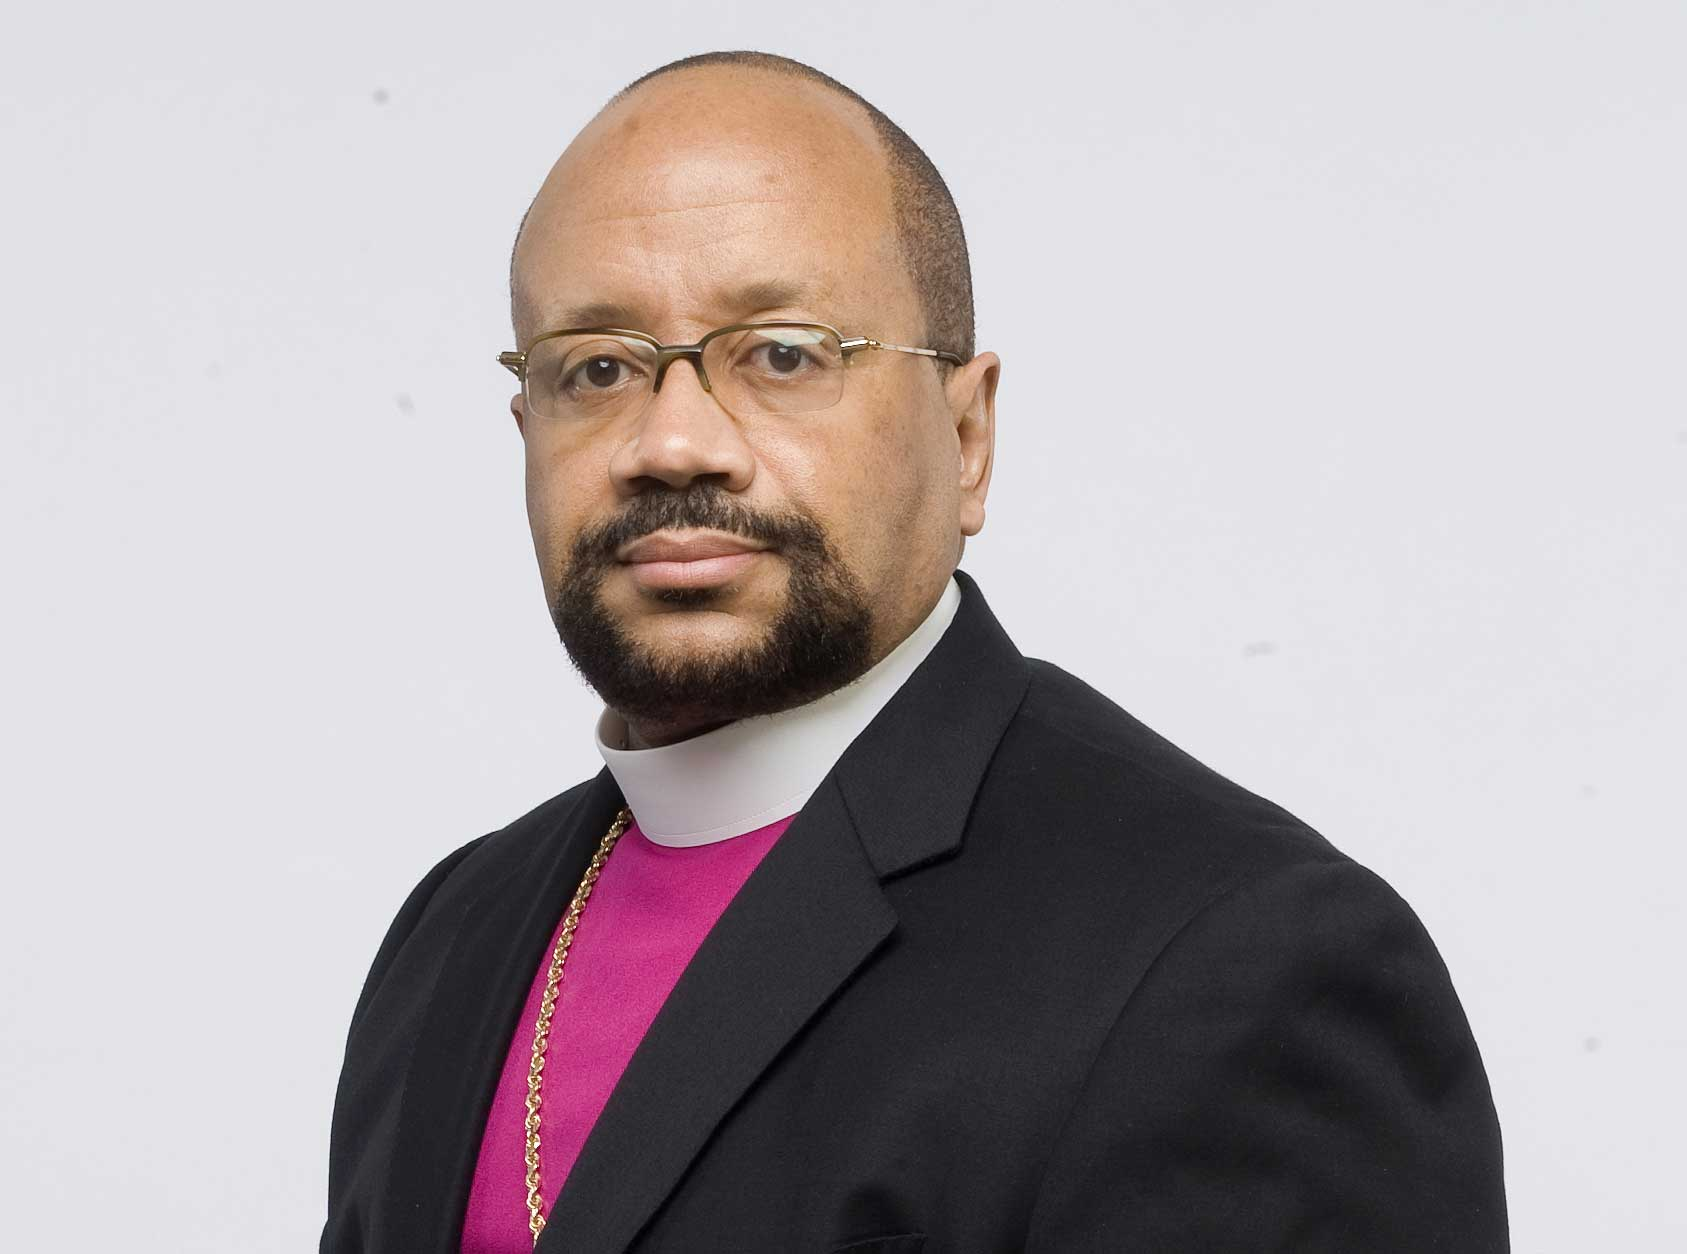 Bishop Donald Hilliard, Jr.